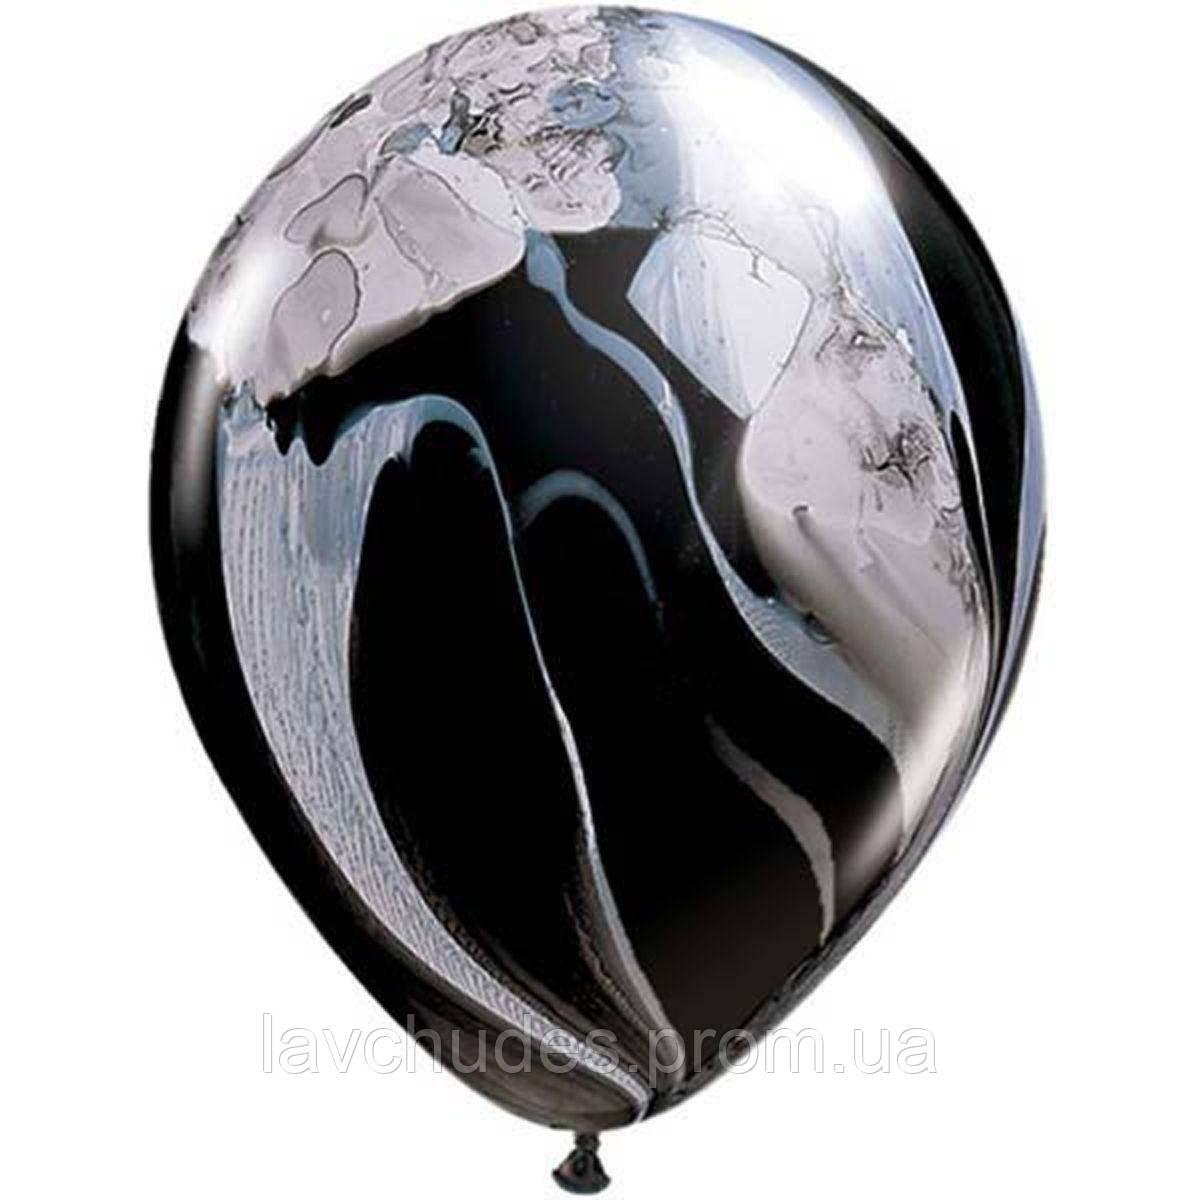 Гелиевые шары Агат - супер агат черно-белый.  Гелиевые шары Киев. Гелиевые шары с доставкой по Киеву.